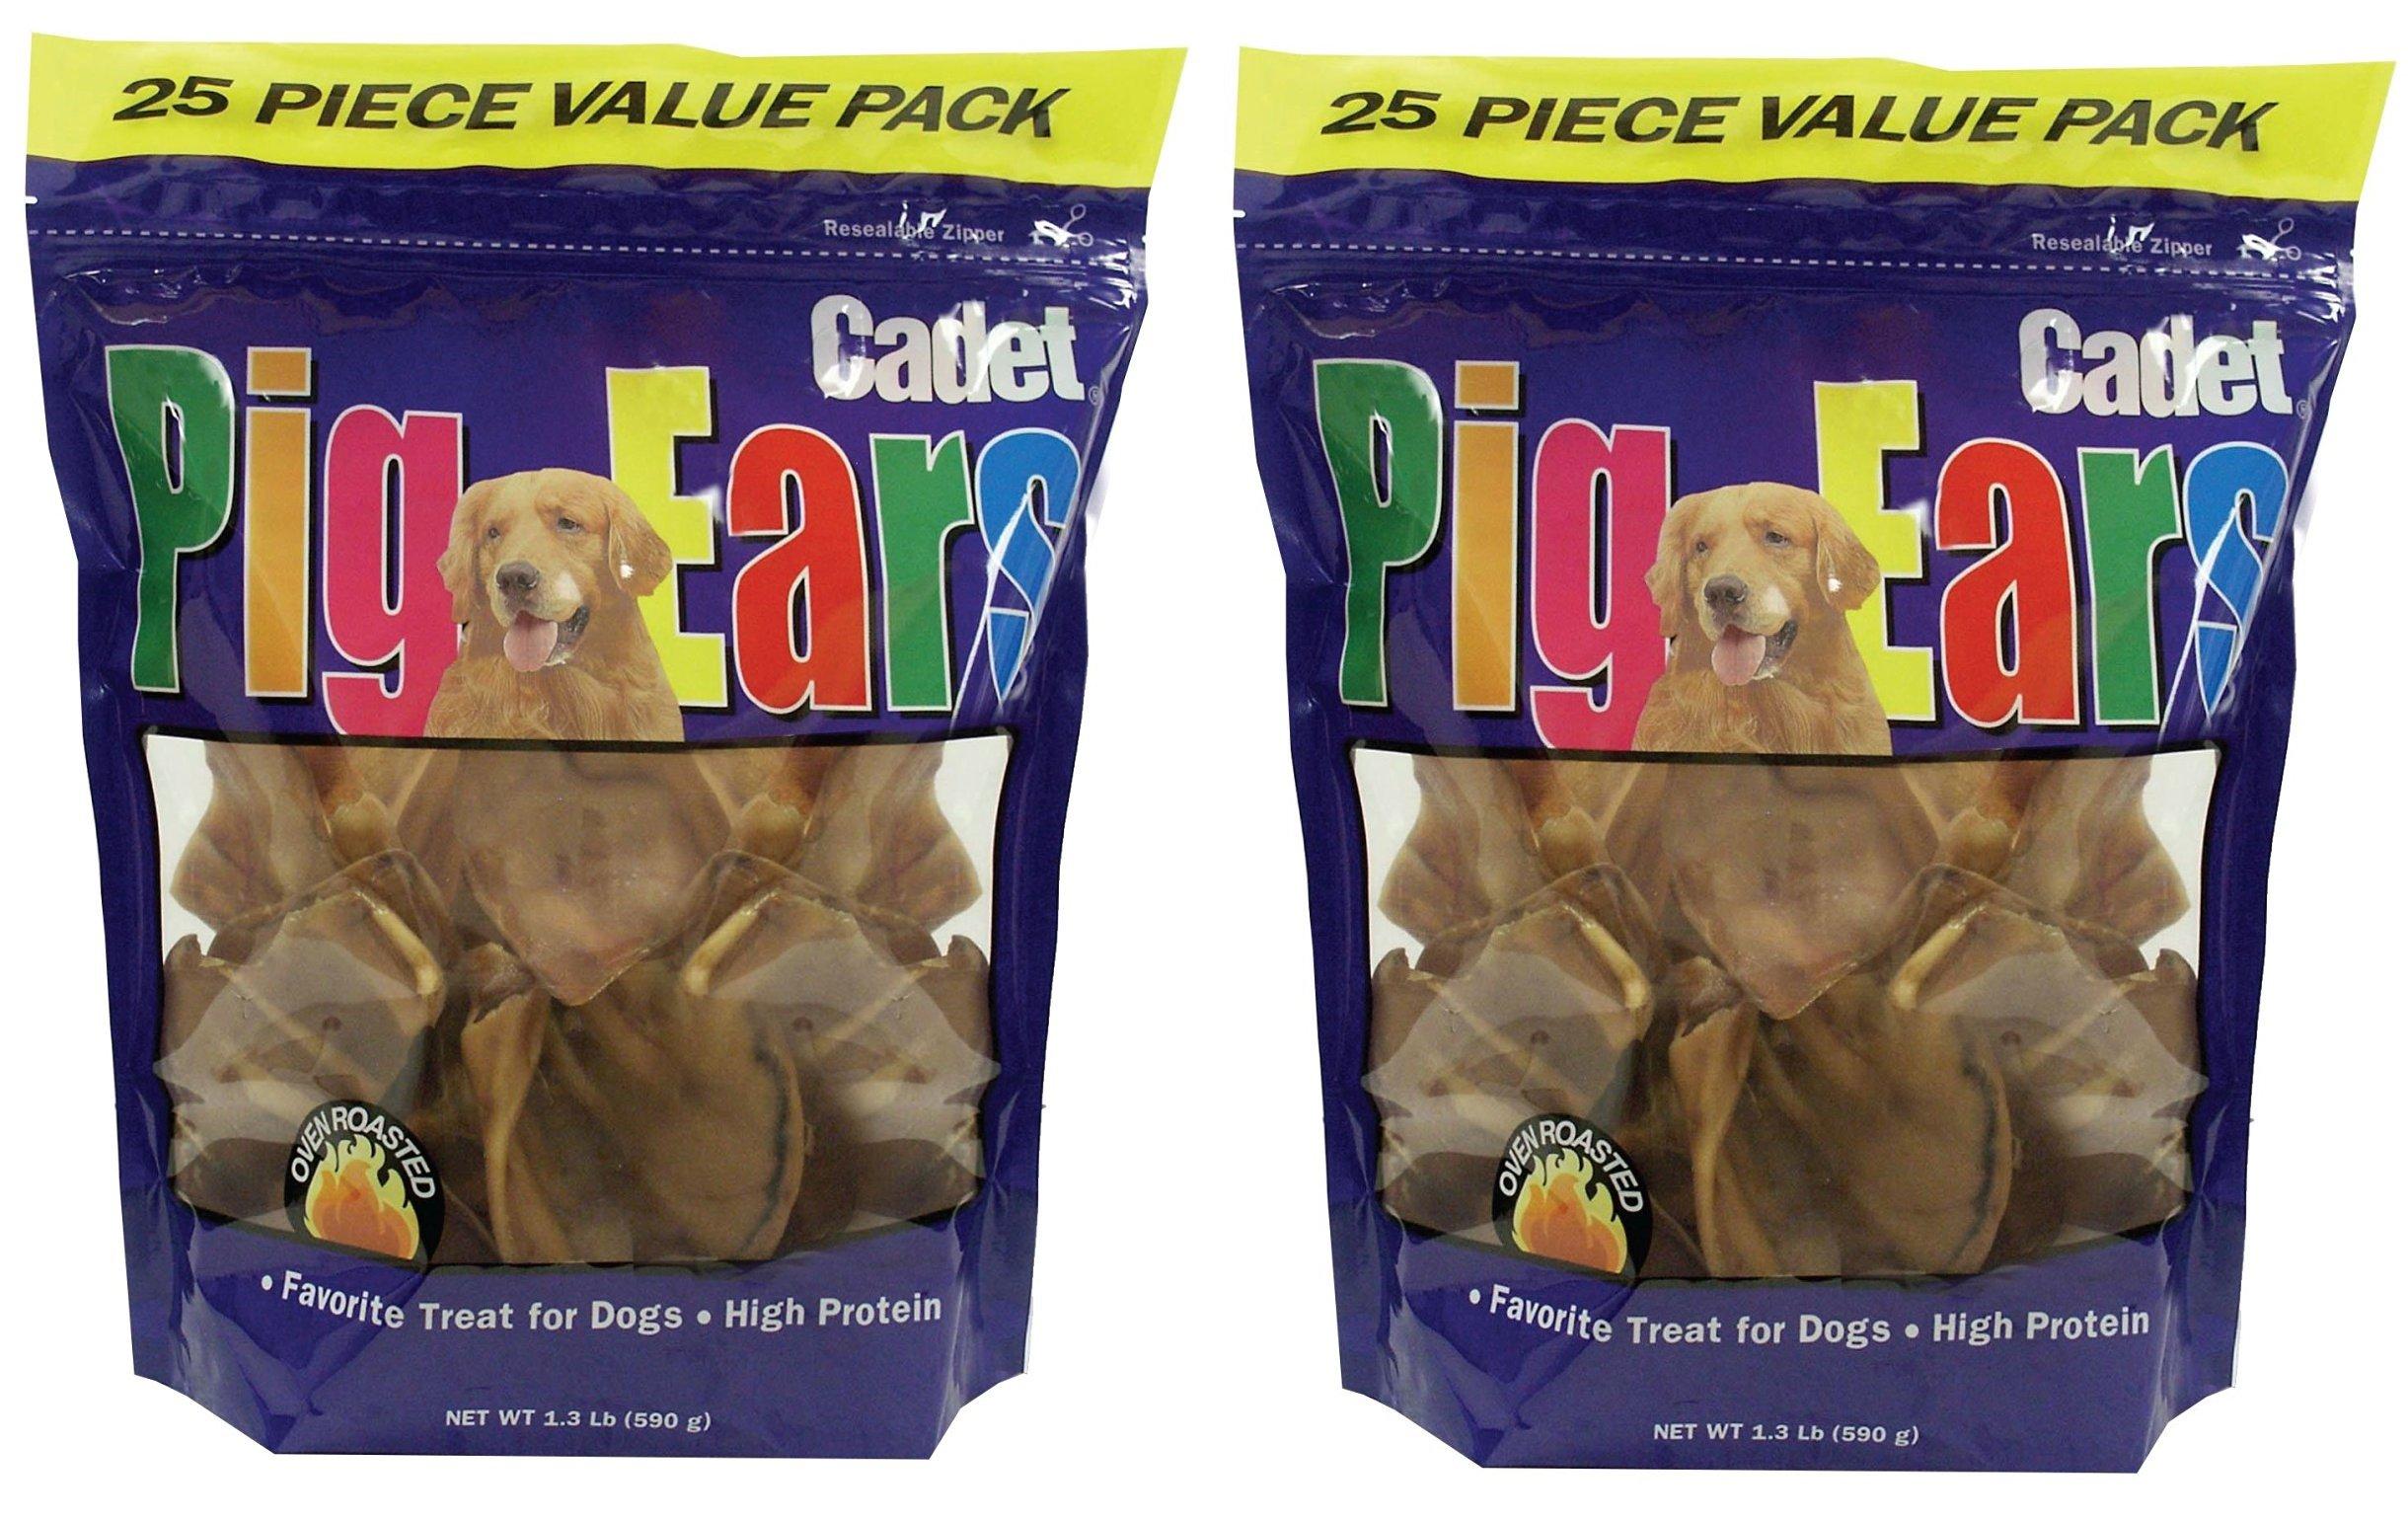 (2 Pack) Cadet Pig Ears - Dog Chews, 25 each